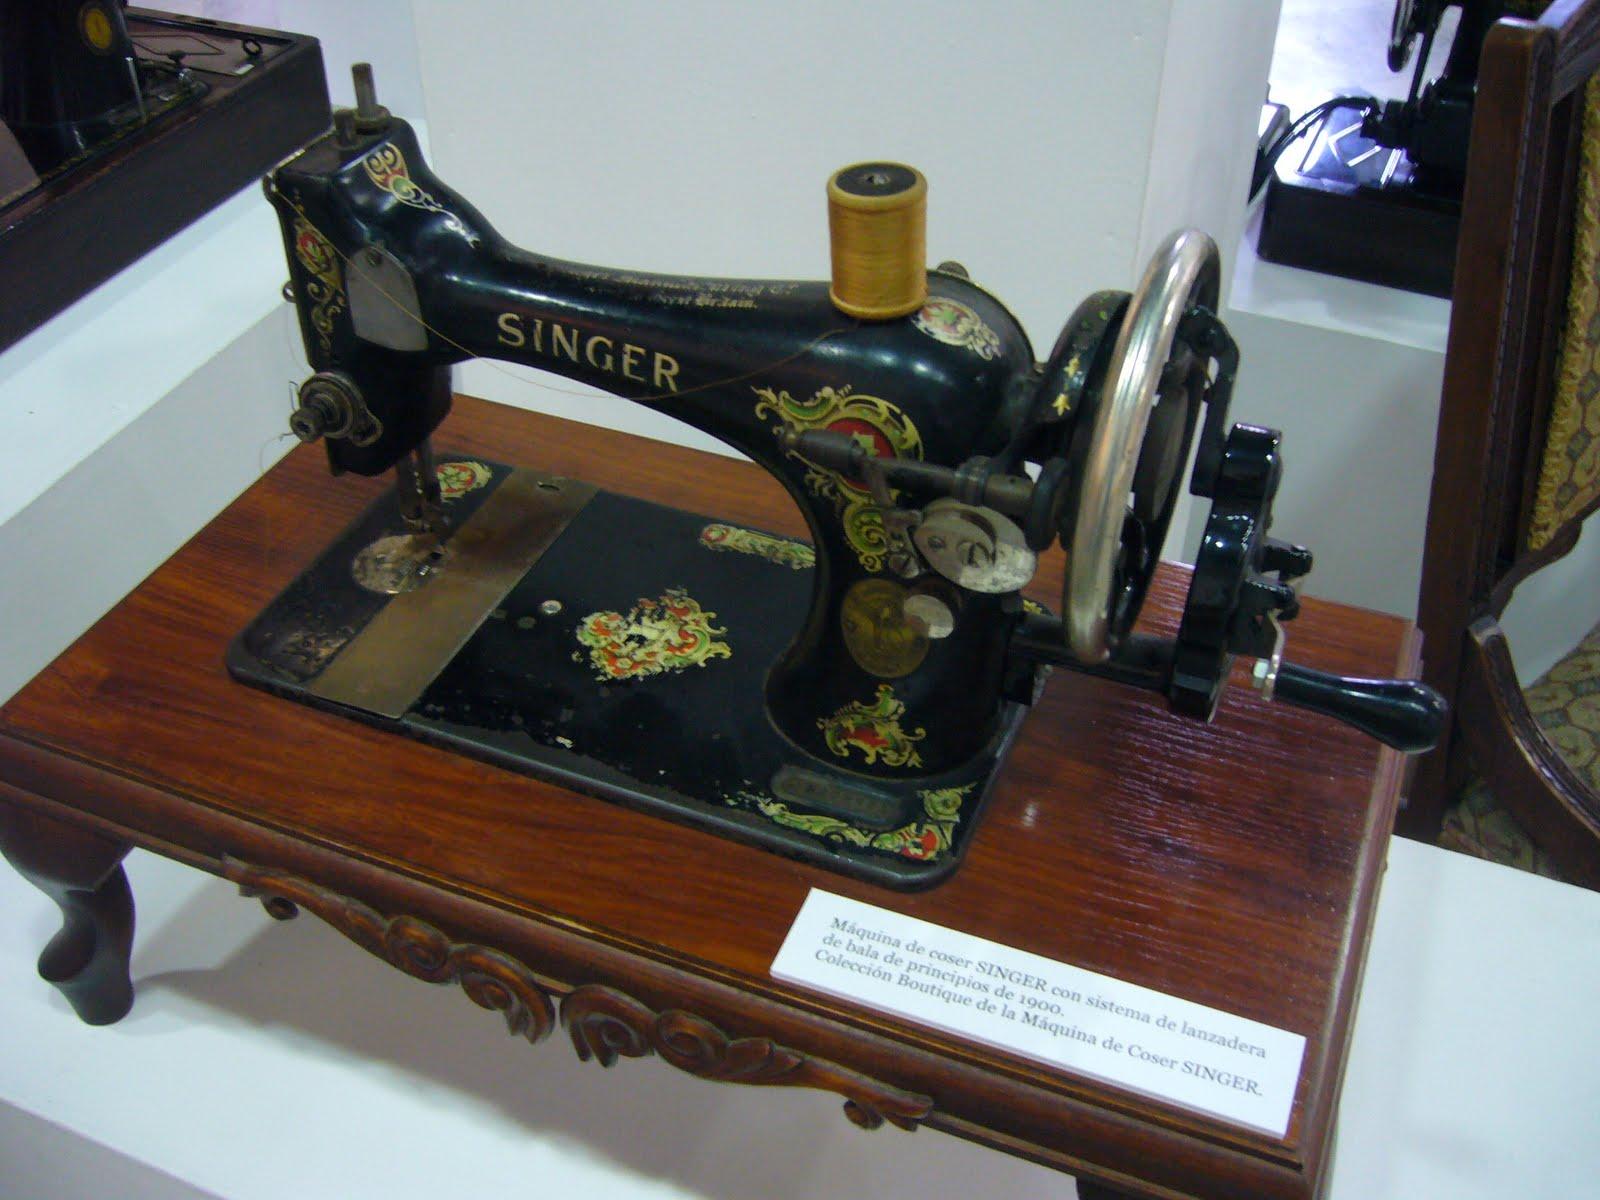 La Restauradora: LO QUE HE APRENDIDOMáquinas de coser.